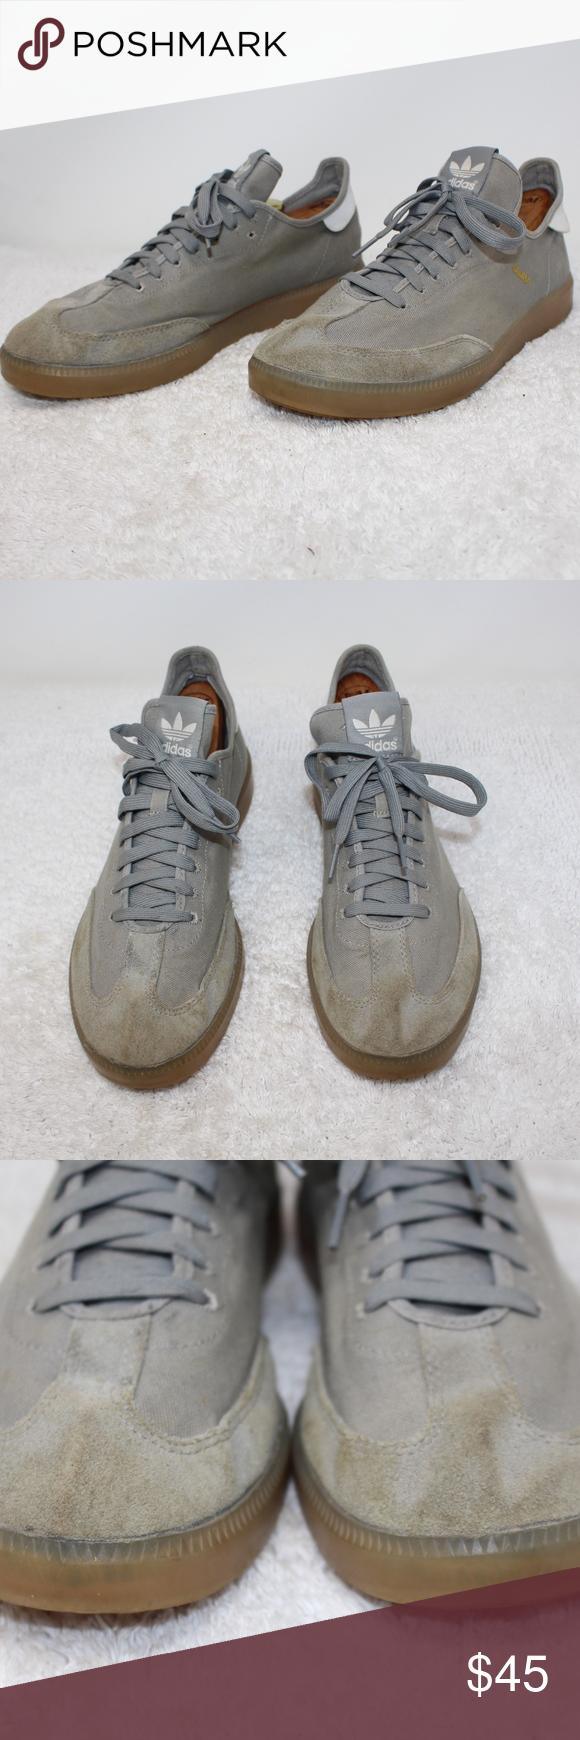 Adidas Samba Size 10.5 Gray Canvas